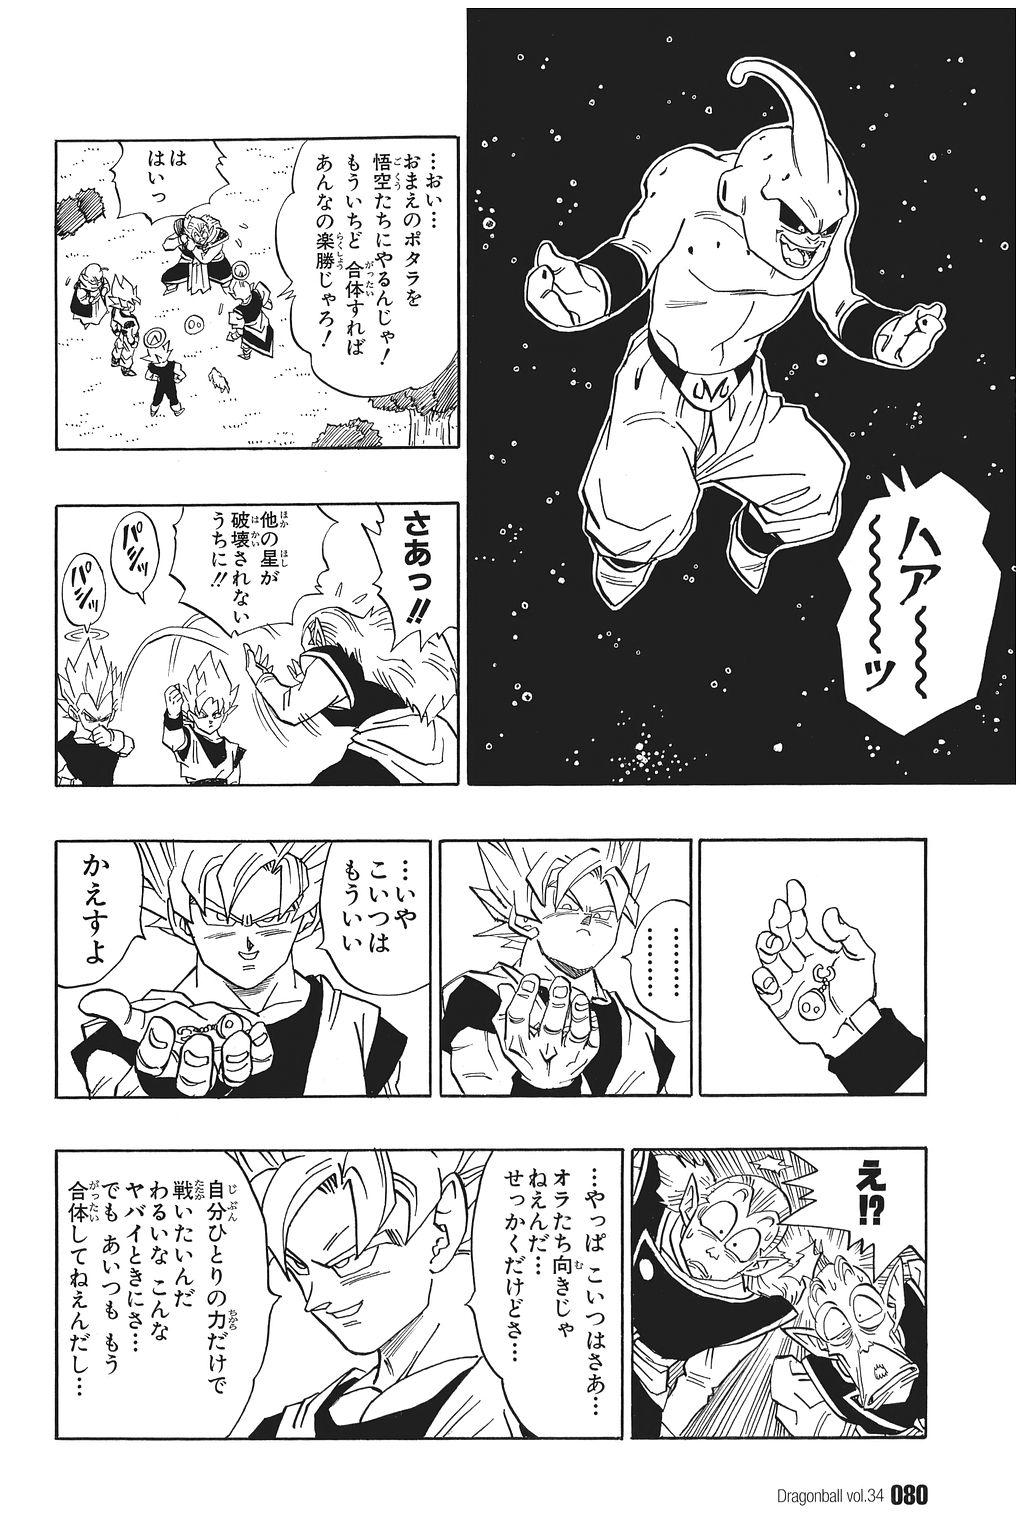 Would it make more sense if kid buu was the strongest buu kanzenshuu image altavistaventures Image collections